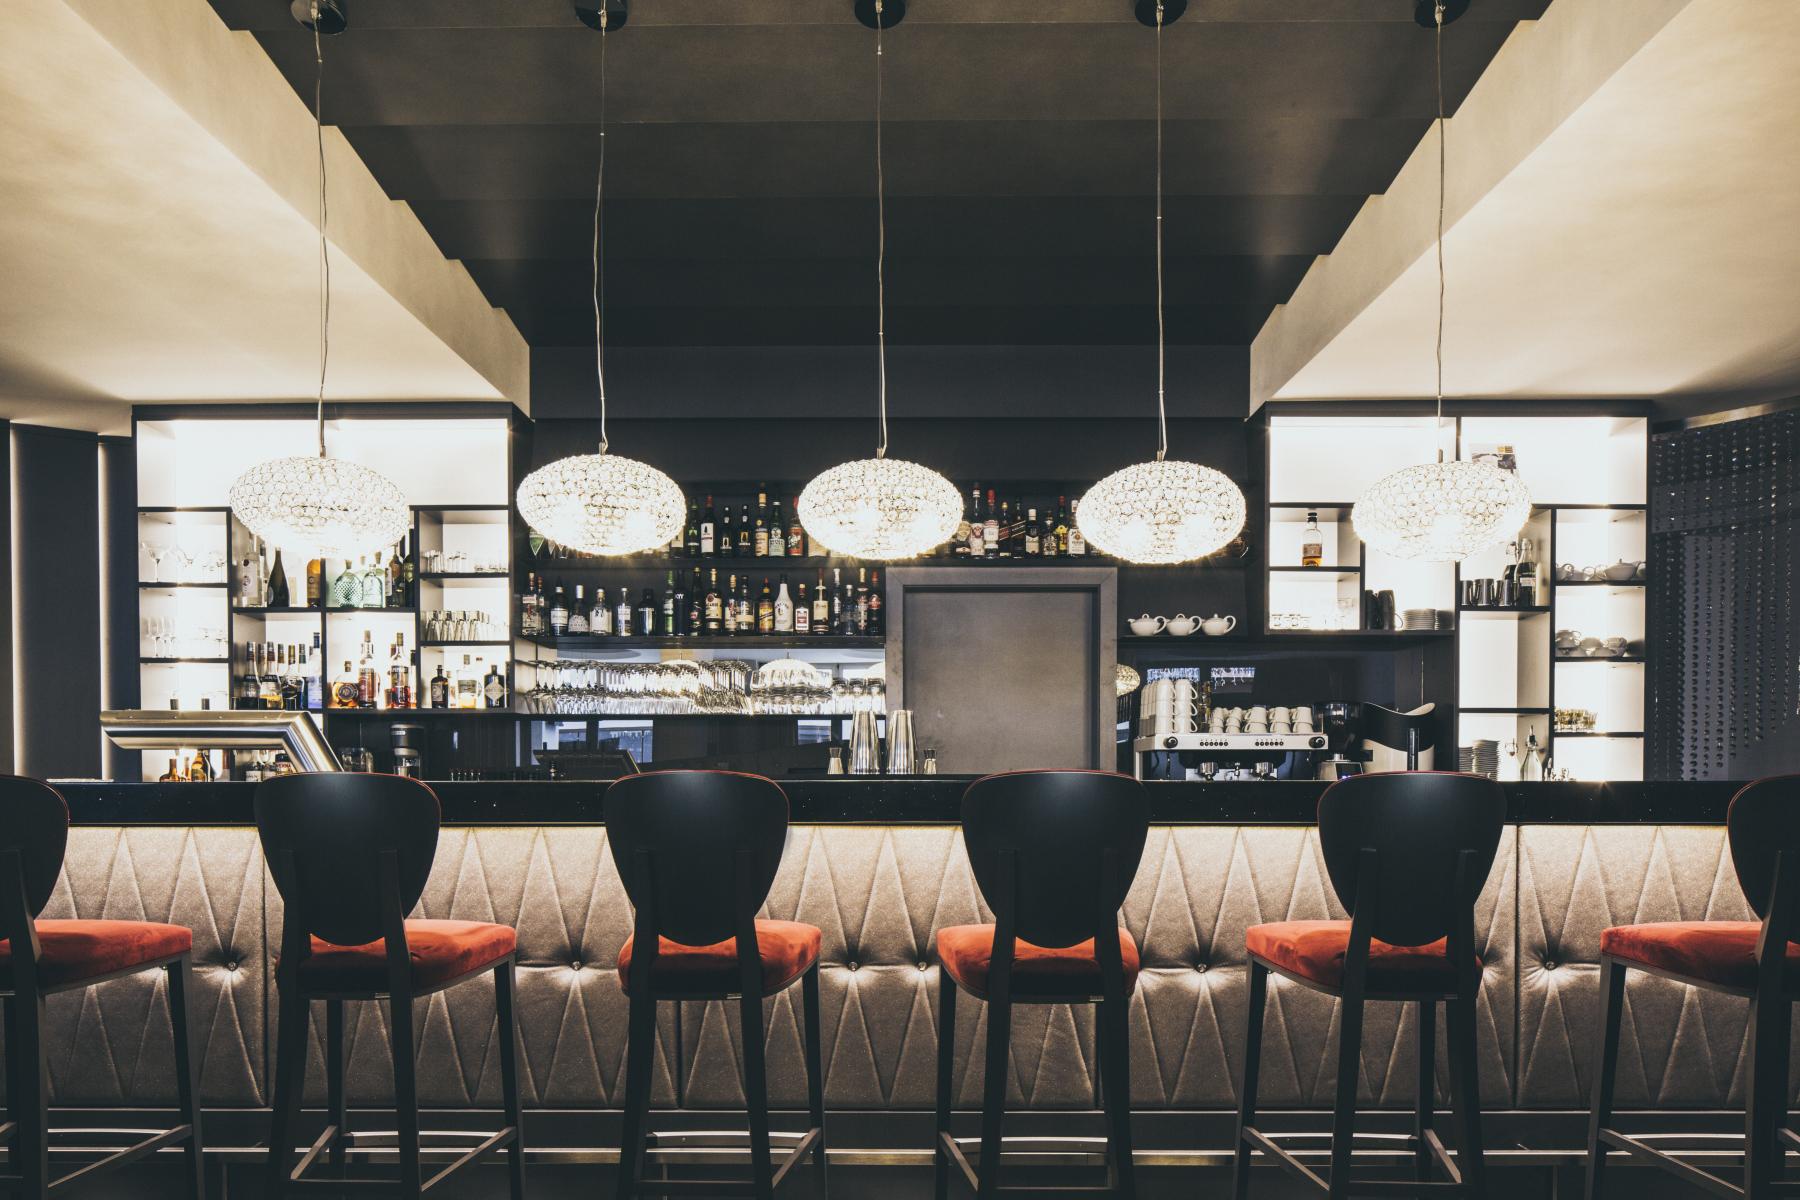 Hotel The Crystal-bar © mindpark_Daniel Zangerl